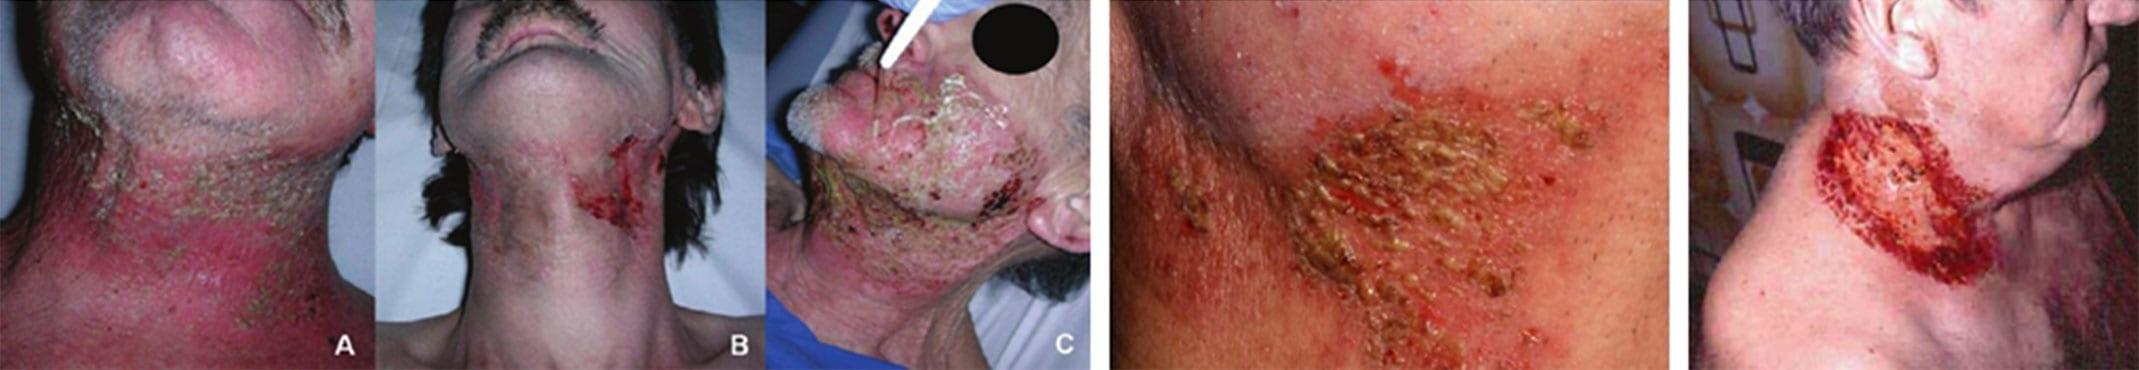 radiodermita simptome